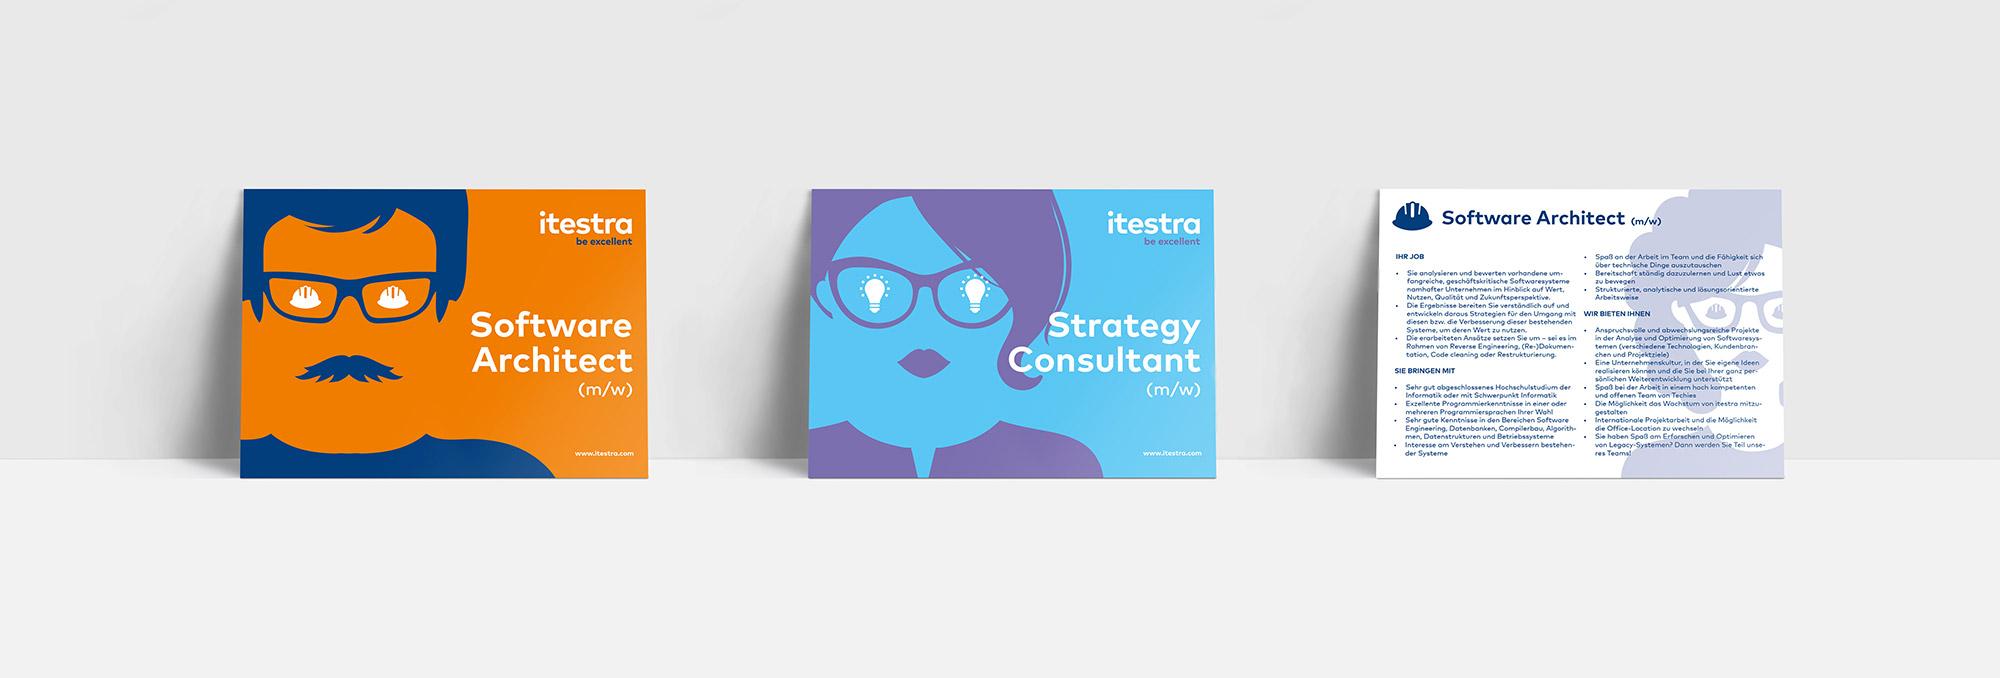 Itestra – Postcard Design